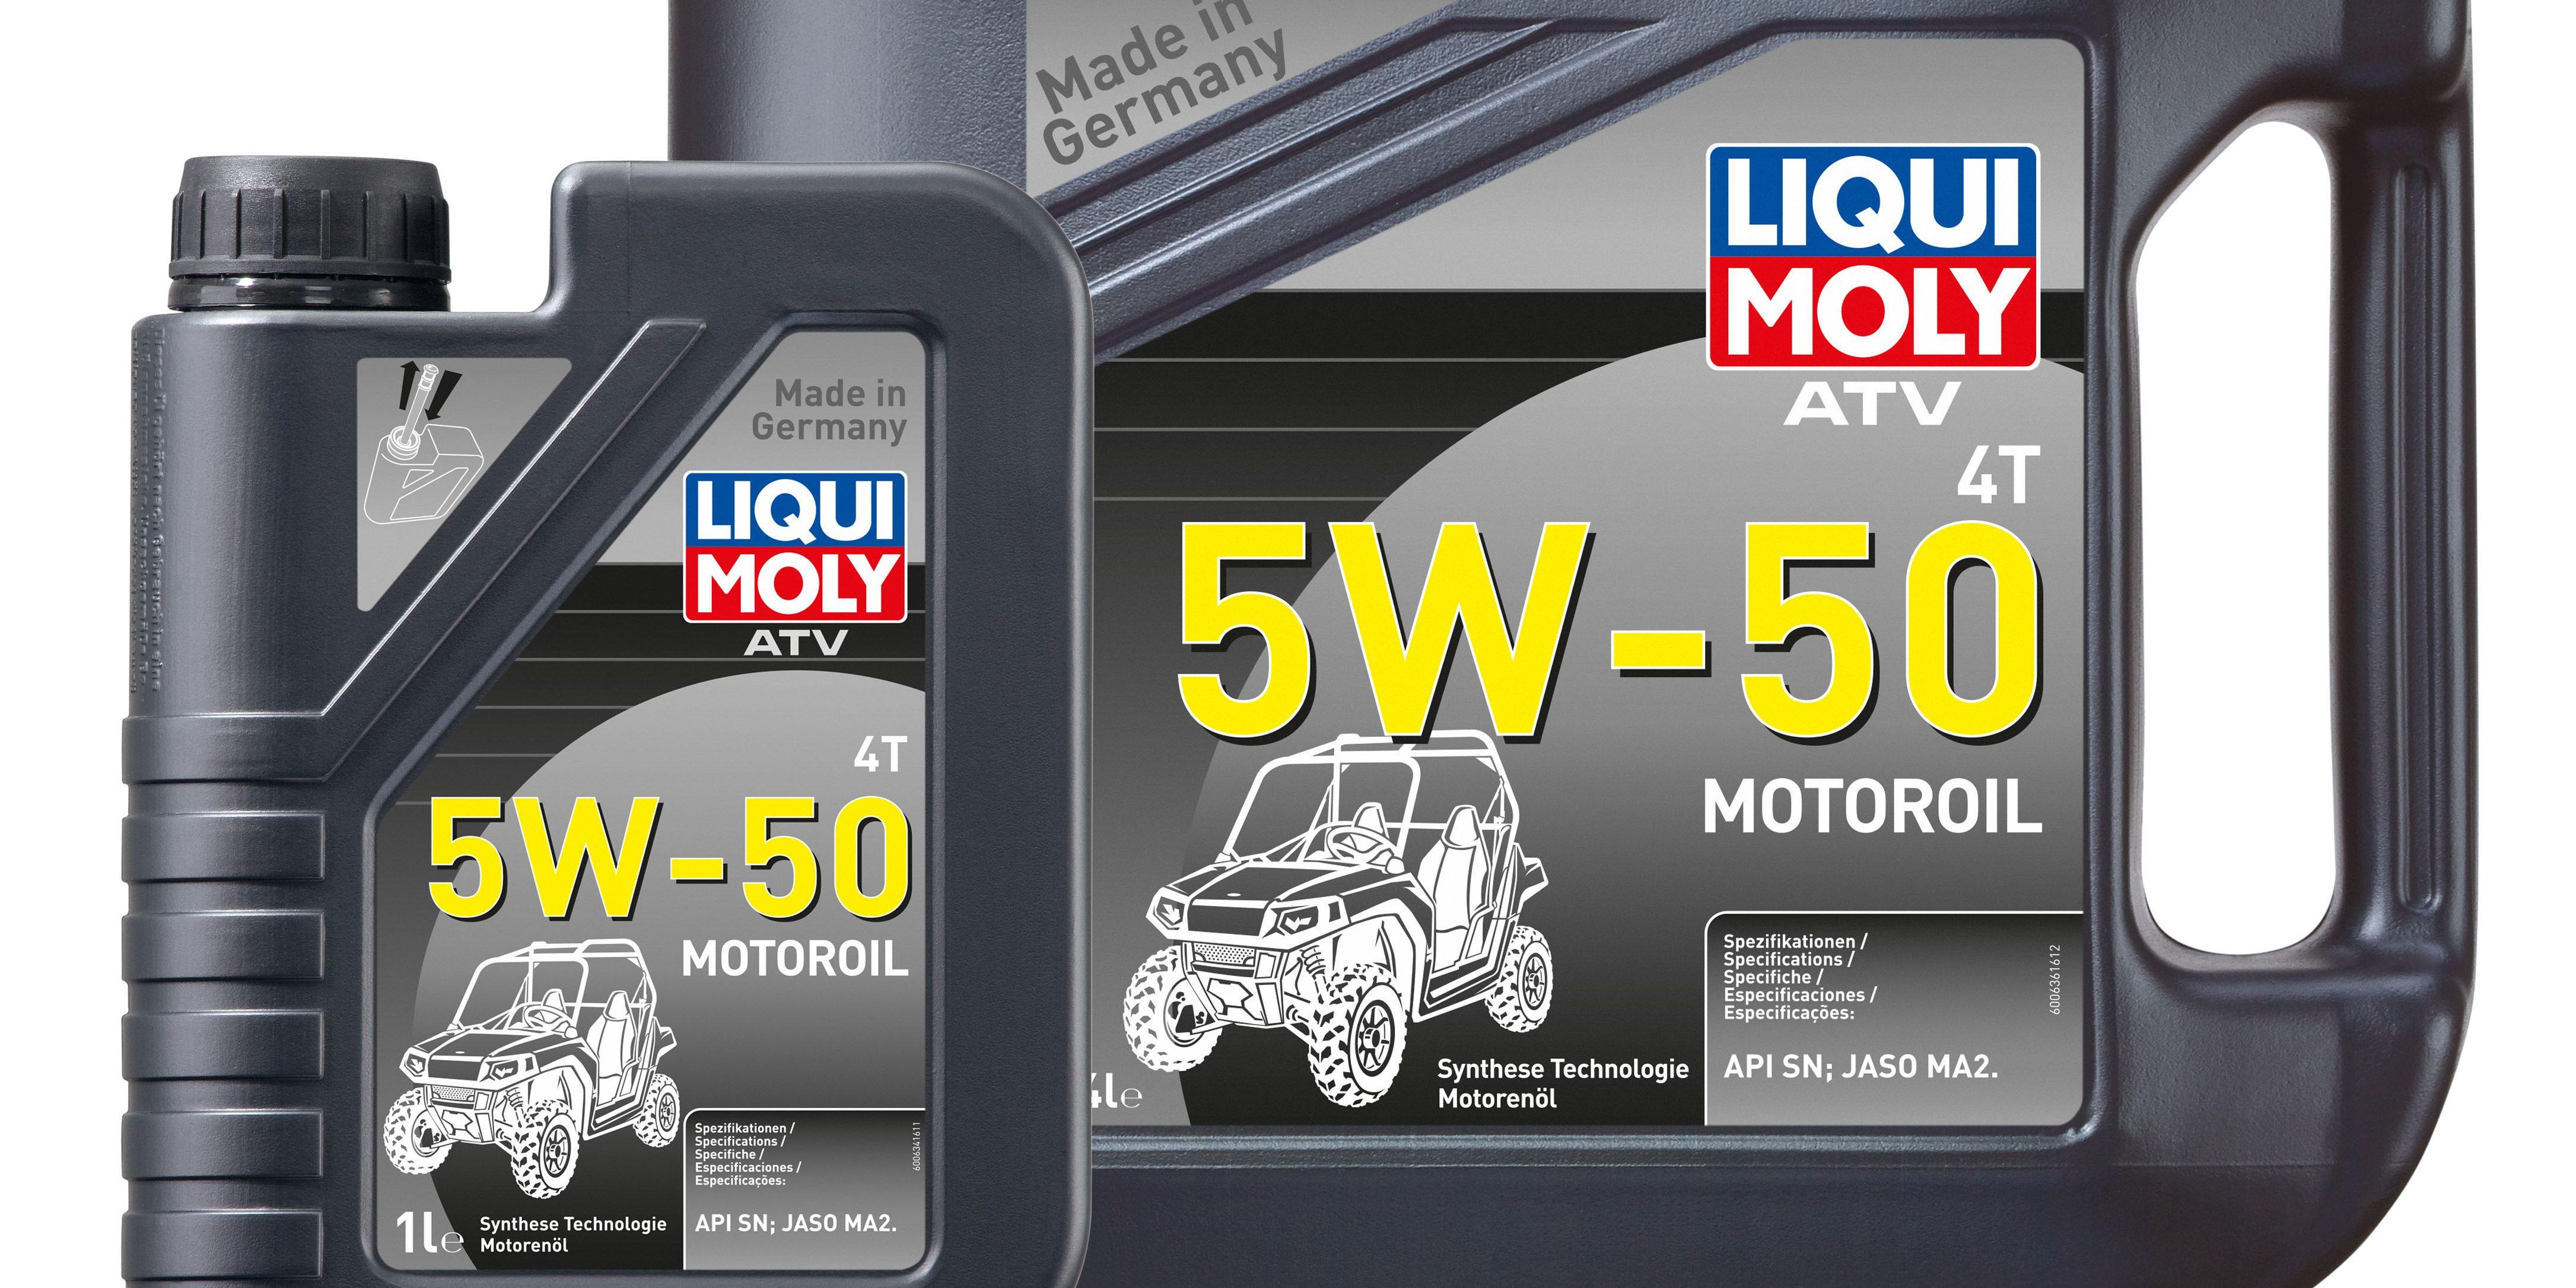 LIQUI MOLY presents its new motor oil for UTVs - UTV Sports